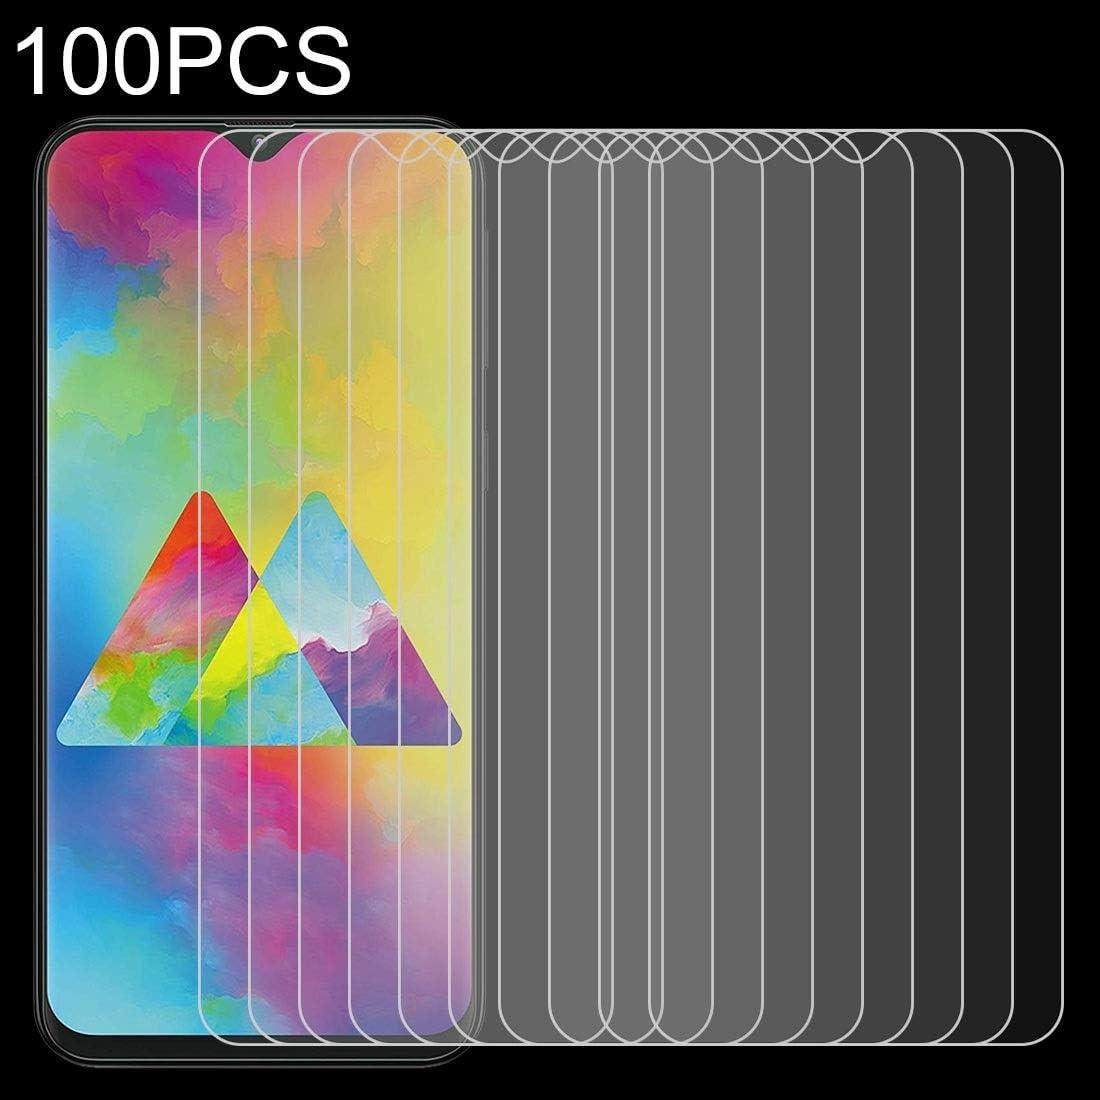 Premium Tempered Glass Screen Film 100 PCS 0.26mm 9H 2.5D Tempered Glass Film for Galaxy M20 Anti-Scratch Screen Protector